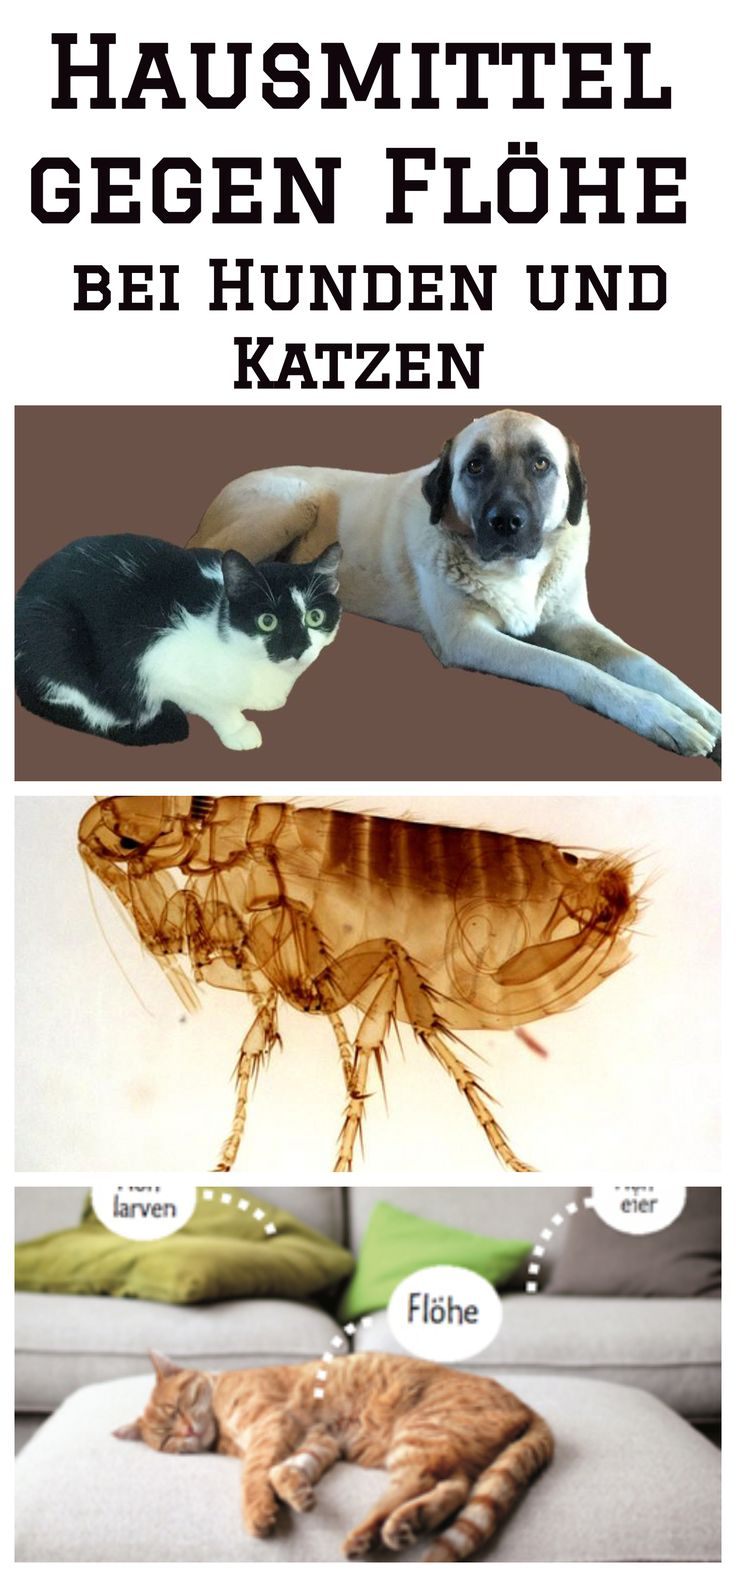 hausmittel gegen fl he bei hunden und katzen hausmittel. Black Bedroom Furniture Sets. Home Design Ideas